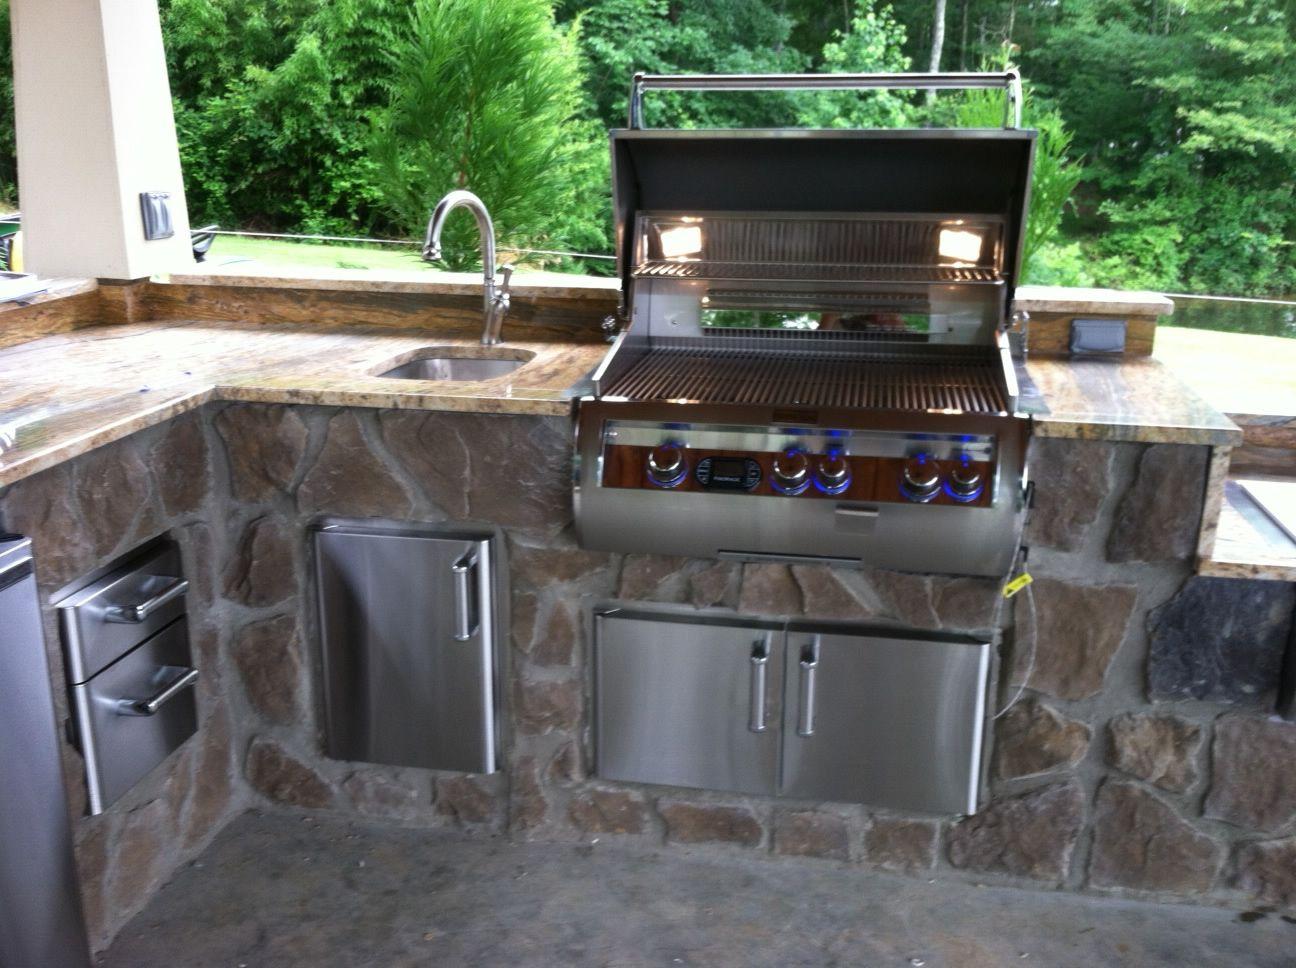 Einbau Gasgrill Outdoor Küche : Gasgrill in outdoor küche einbauen einbau gasgrill outdoor küche